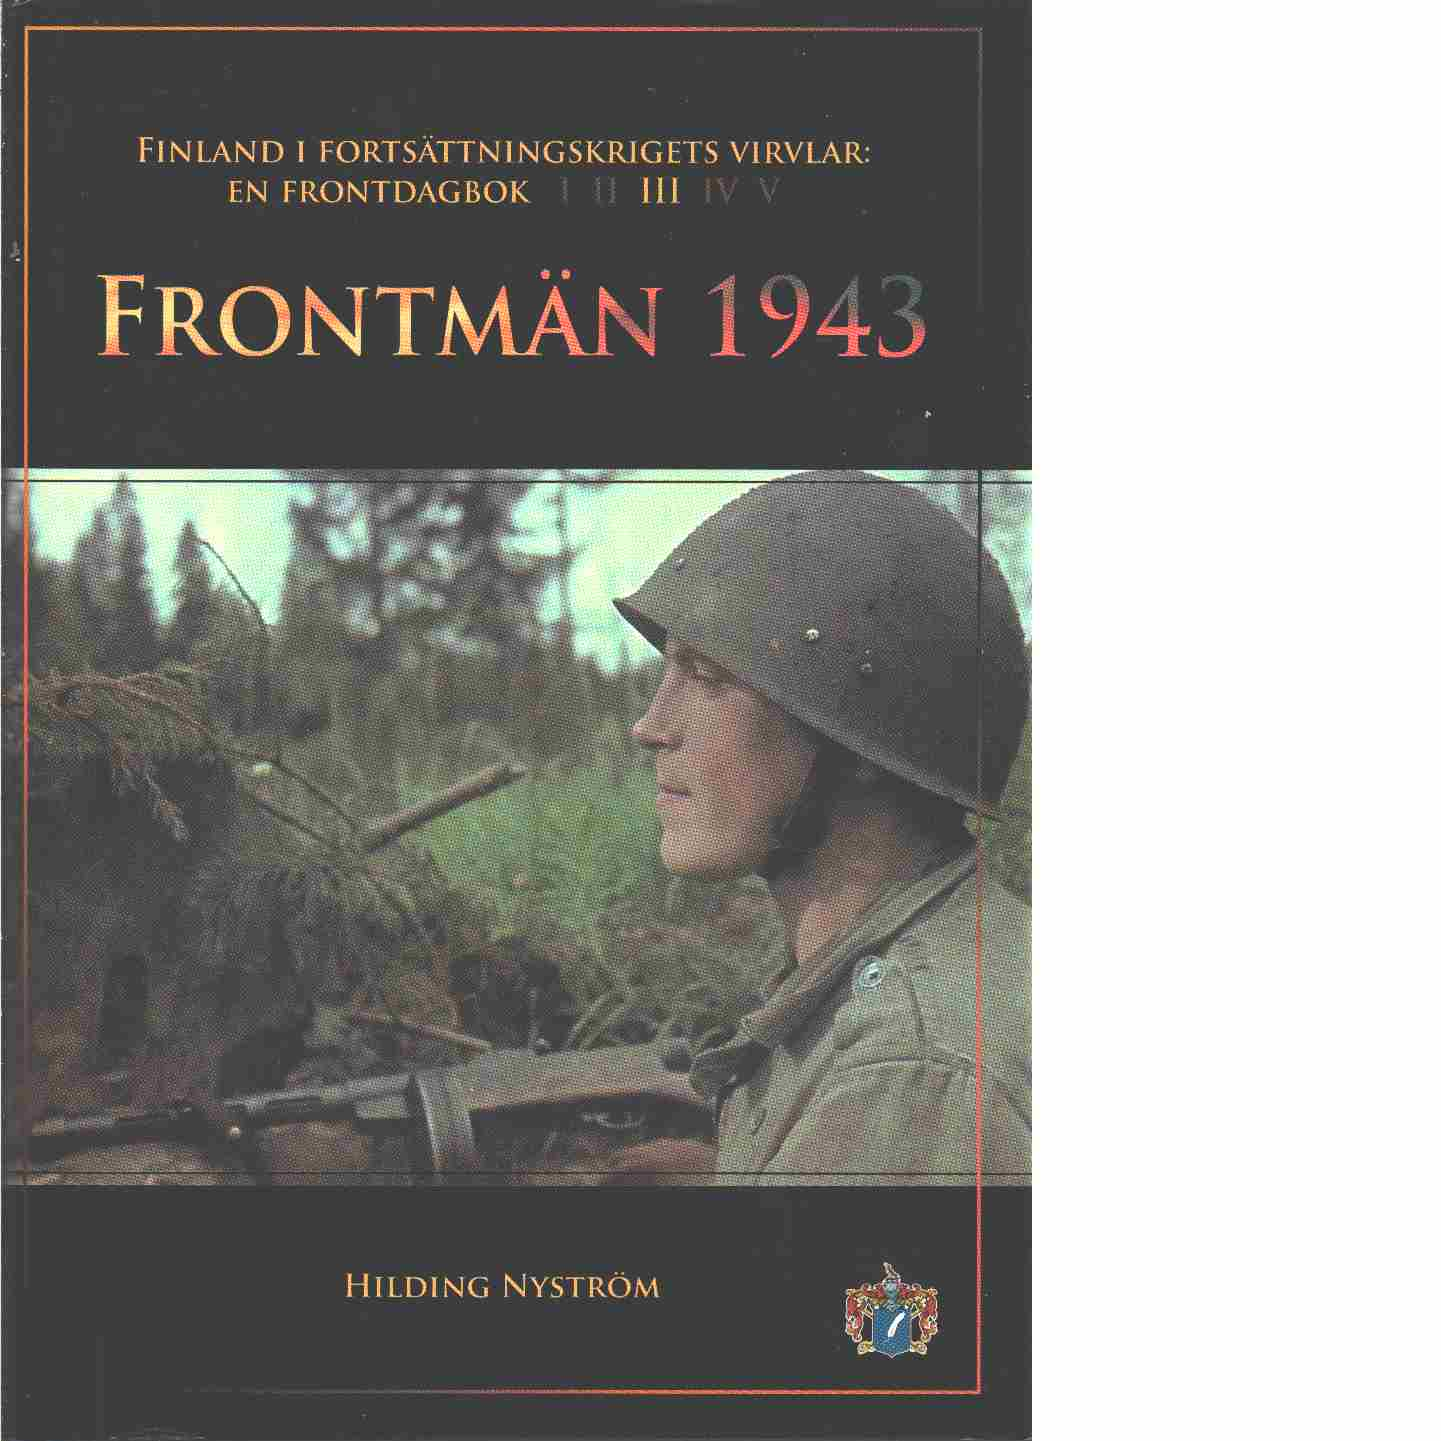 Frontmän 1943 - Finland i fortsättningskrigets virvlar: En frontdagbok del 3 - Nyström, Hilding